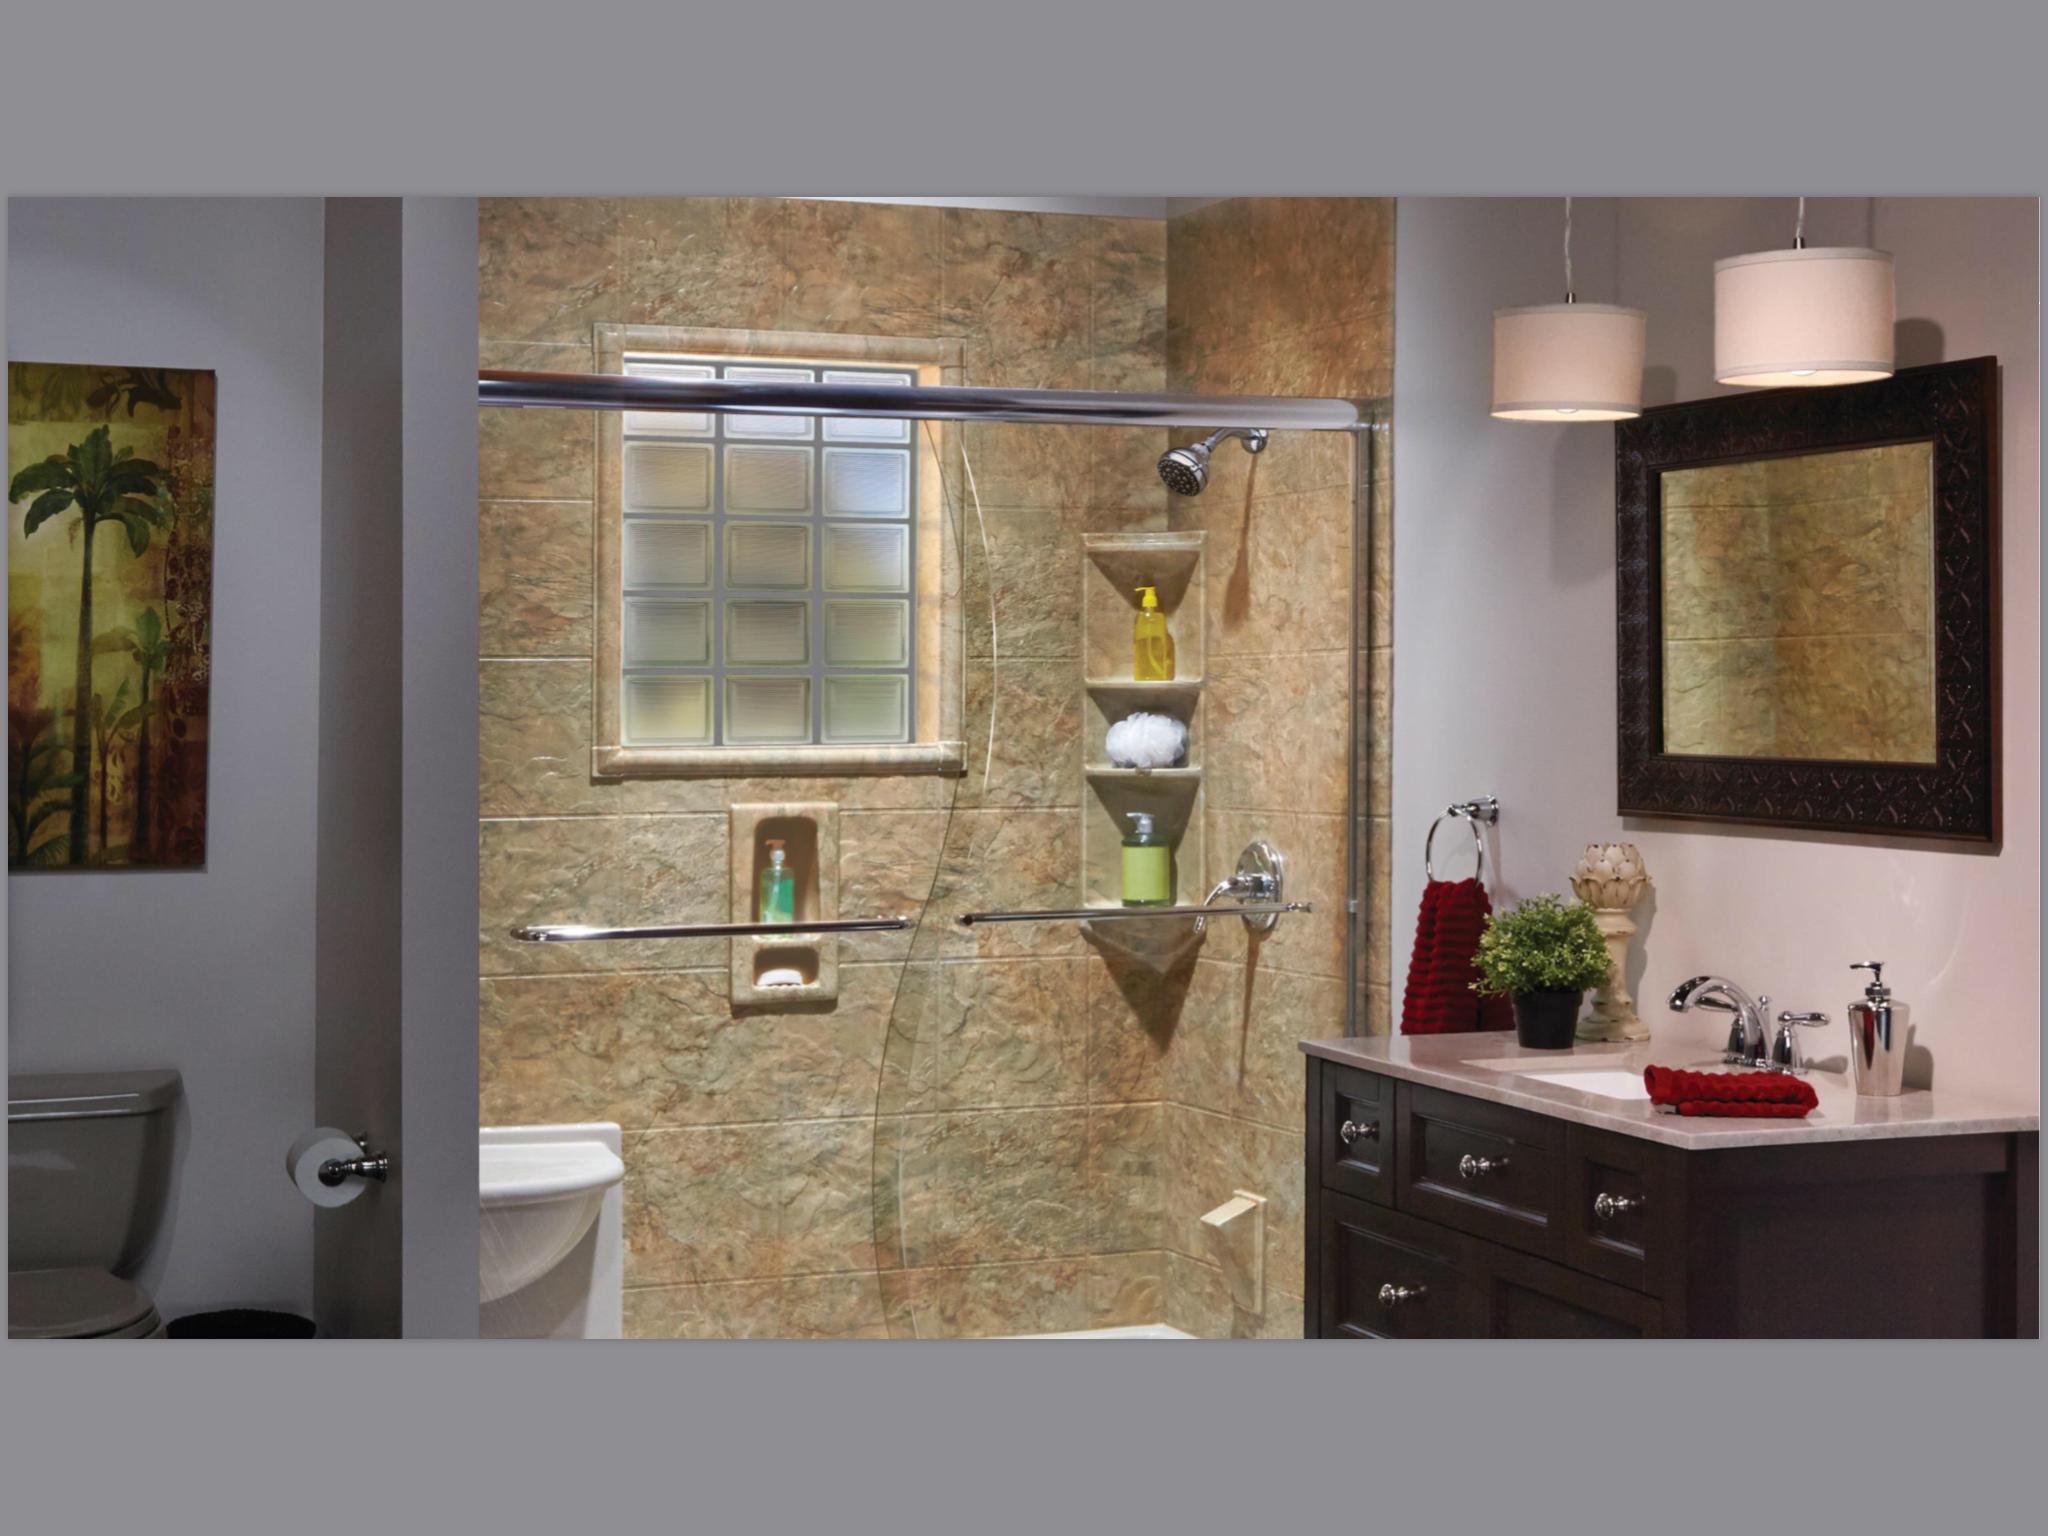 DuraStone Bath Products New Walls Only Keep Tub